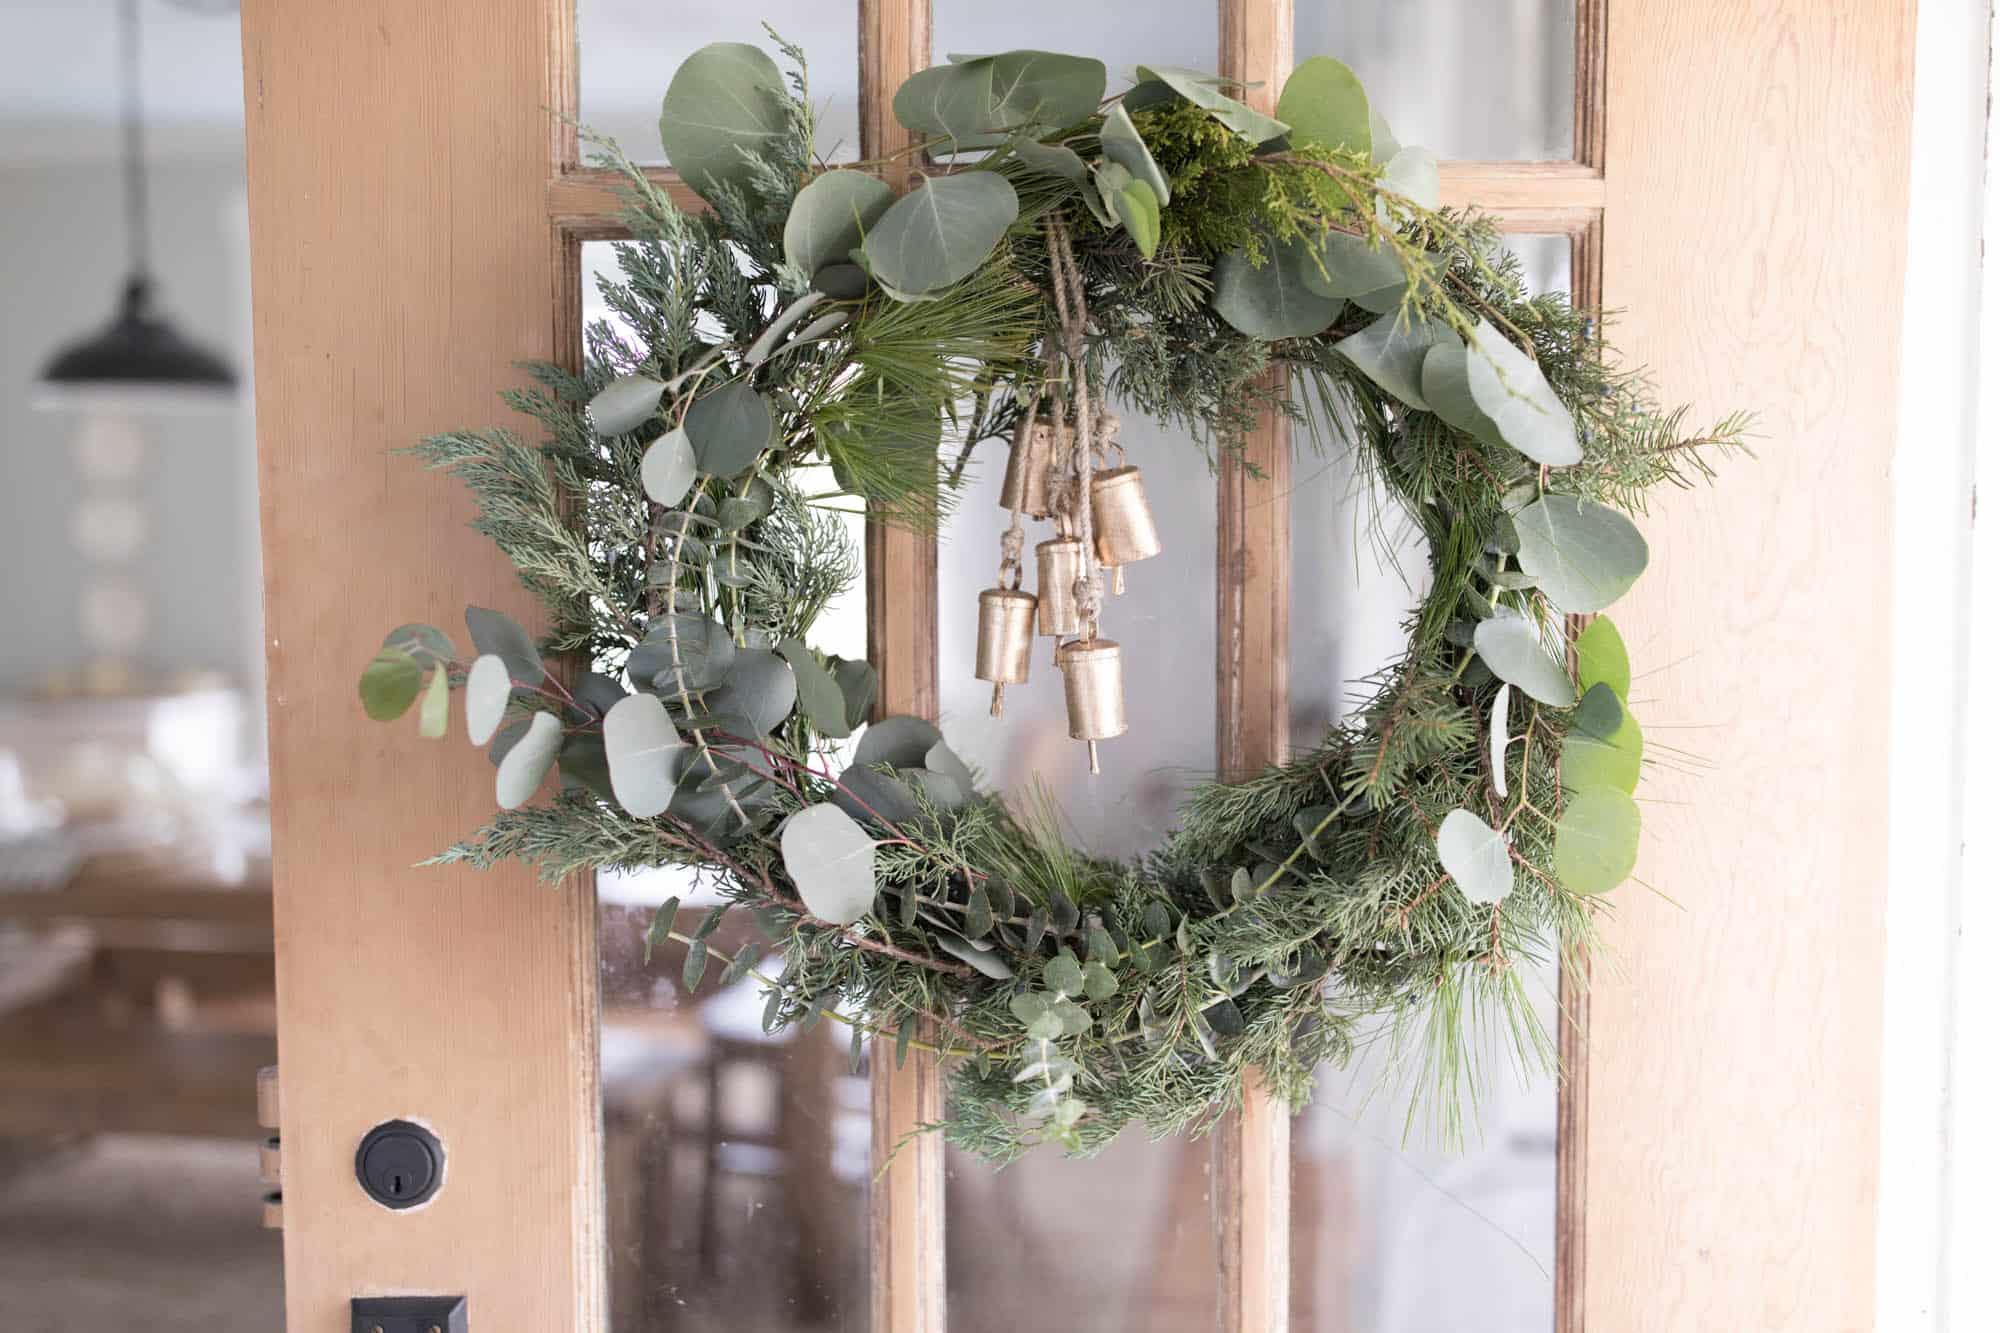 DIY Wreath Christmas- How to Make a Scandinavian Christmas Wreath